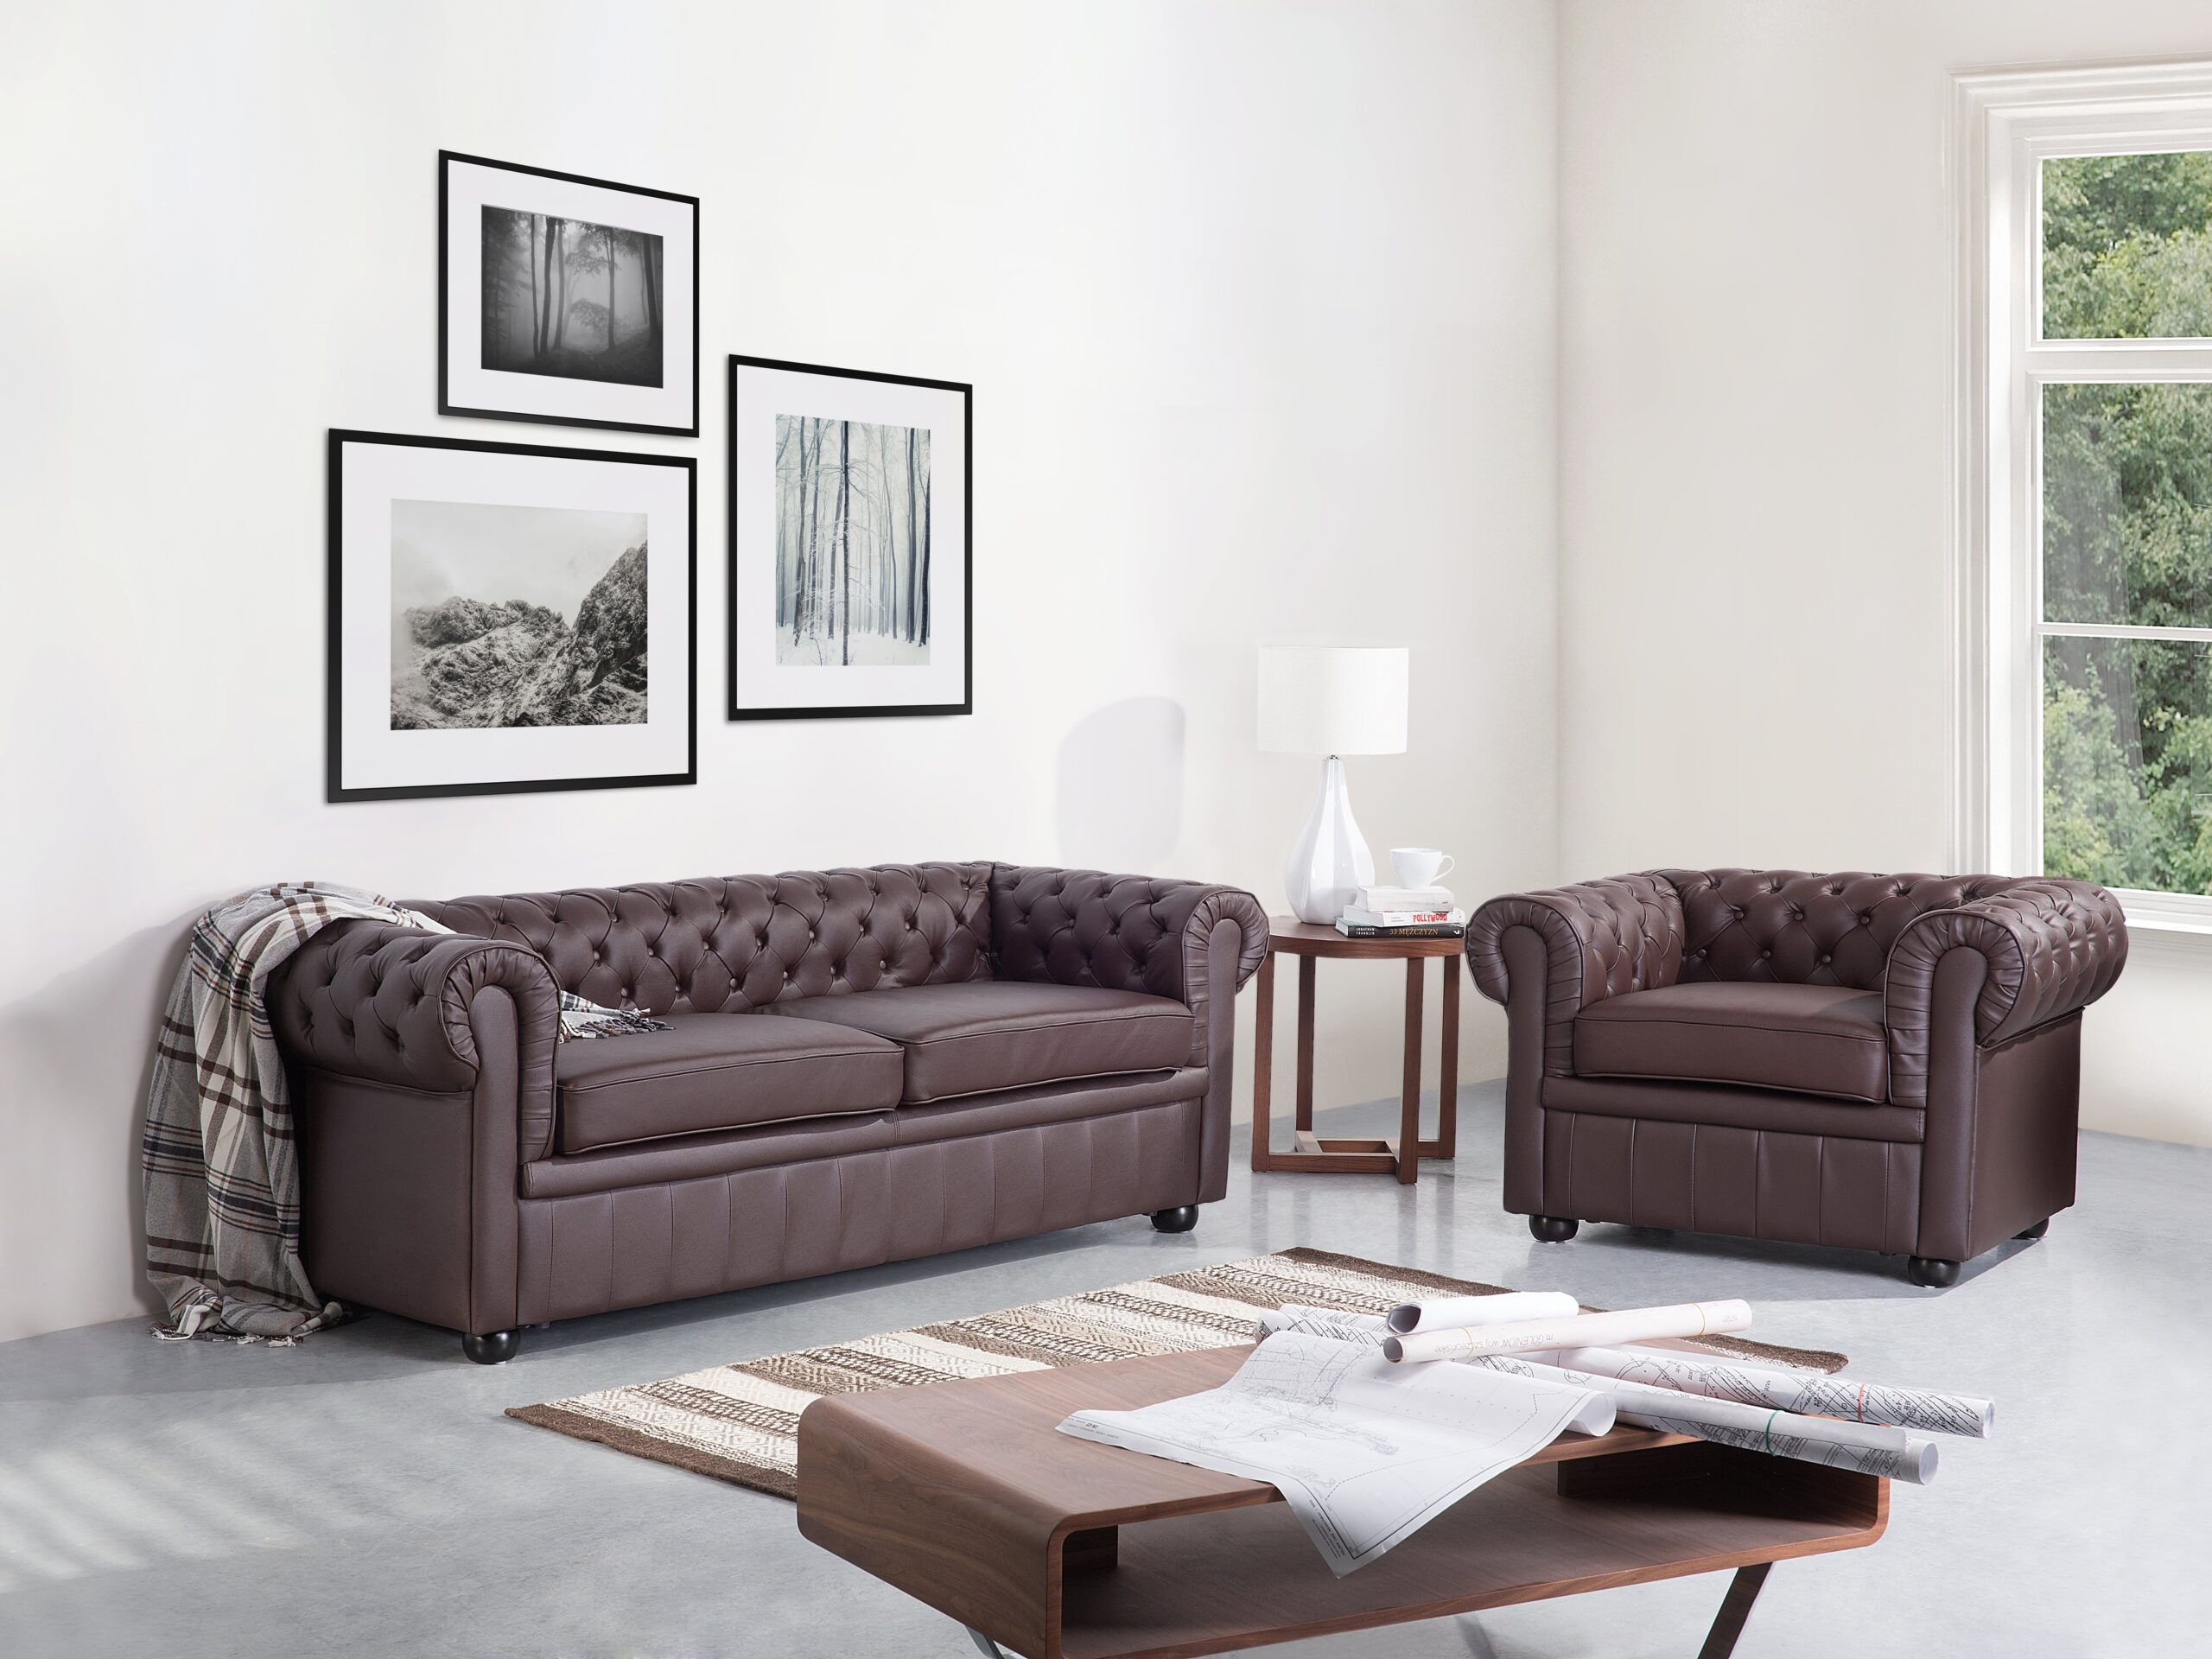 Full Size of Sofa 3 Sitzer Leder Braun   Chesterfield Ikea Ledersofa Design Kaufen 3 2 1 Couch Gebraucht Vintage Rustikal Set Belianide Alternatives Innovation Berlin Sofa Sofa Leder Braun